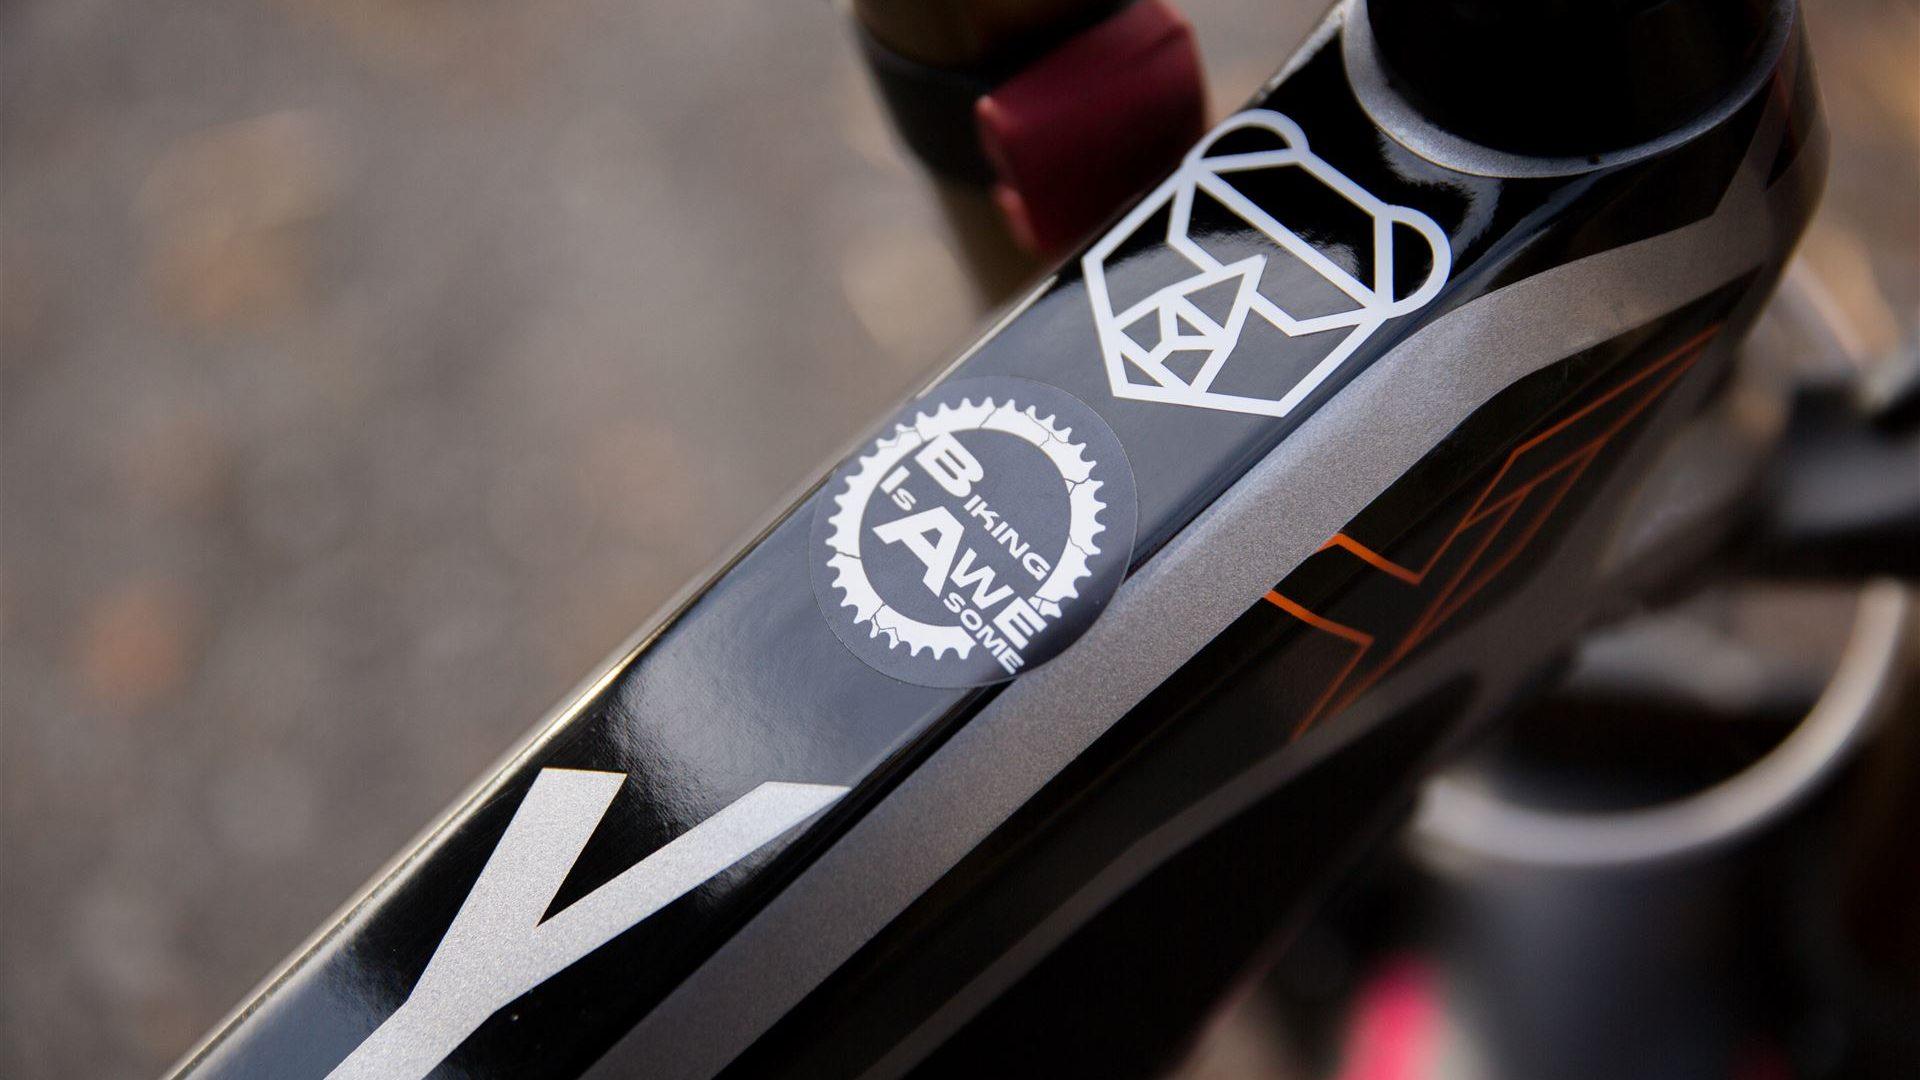 Biking is awesome Sport fotografie / Canon Eos 5d mark 3 / Canon L 24 70 f2.8